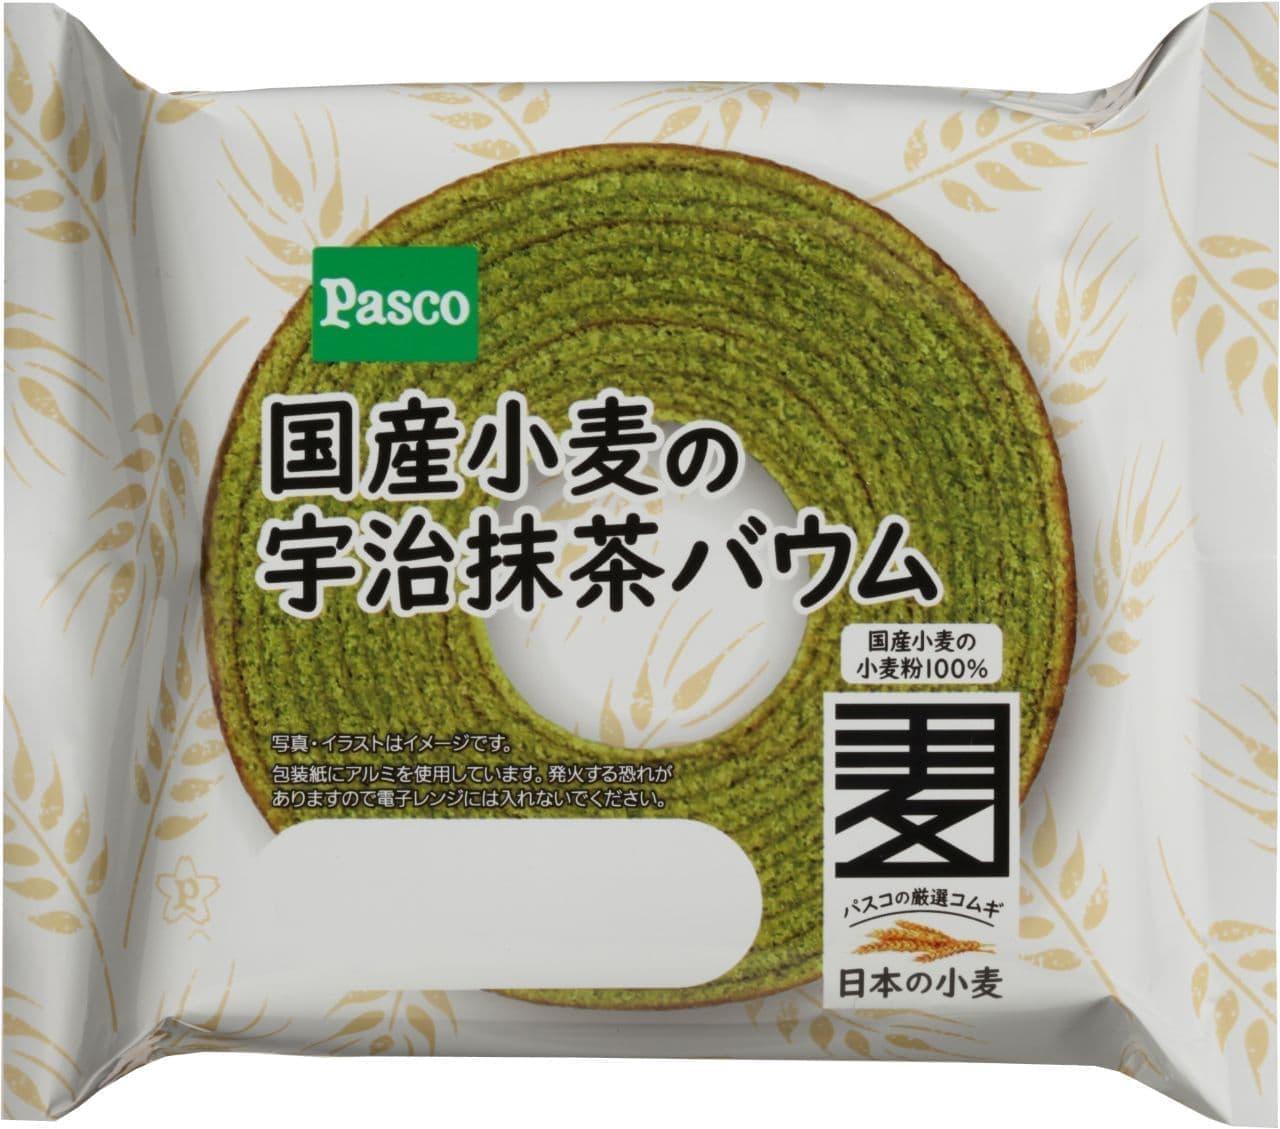 Pasco「国産小麦の宇治抹茶バウム」